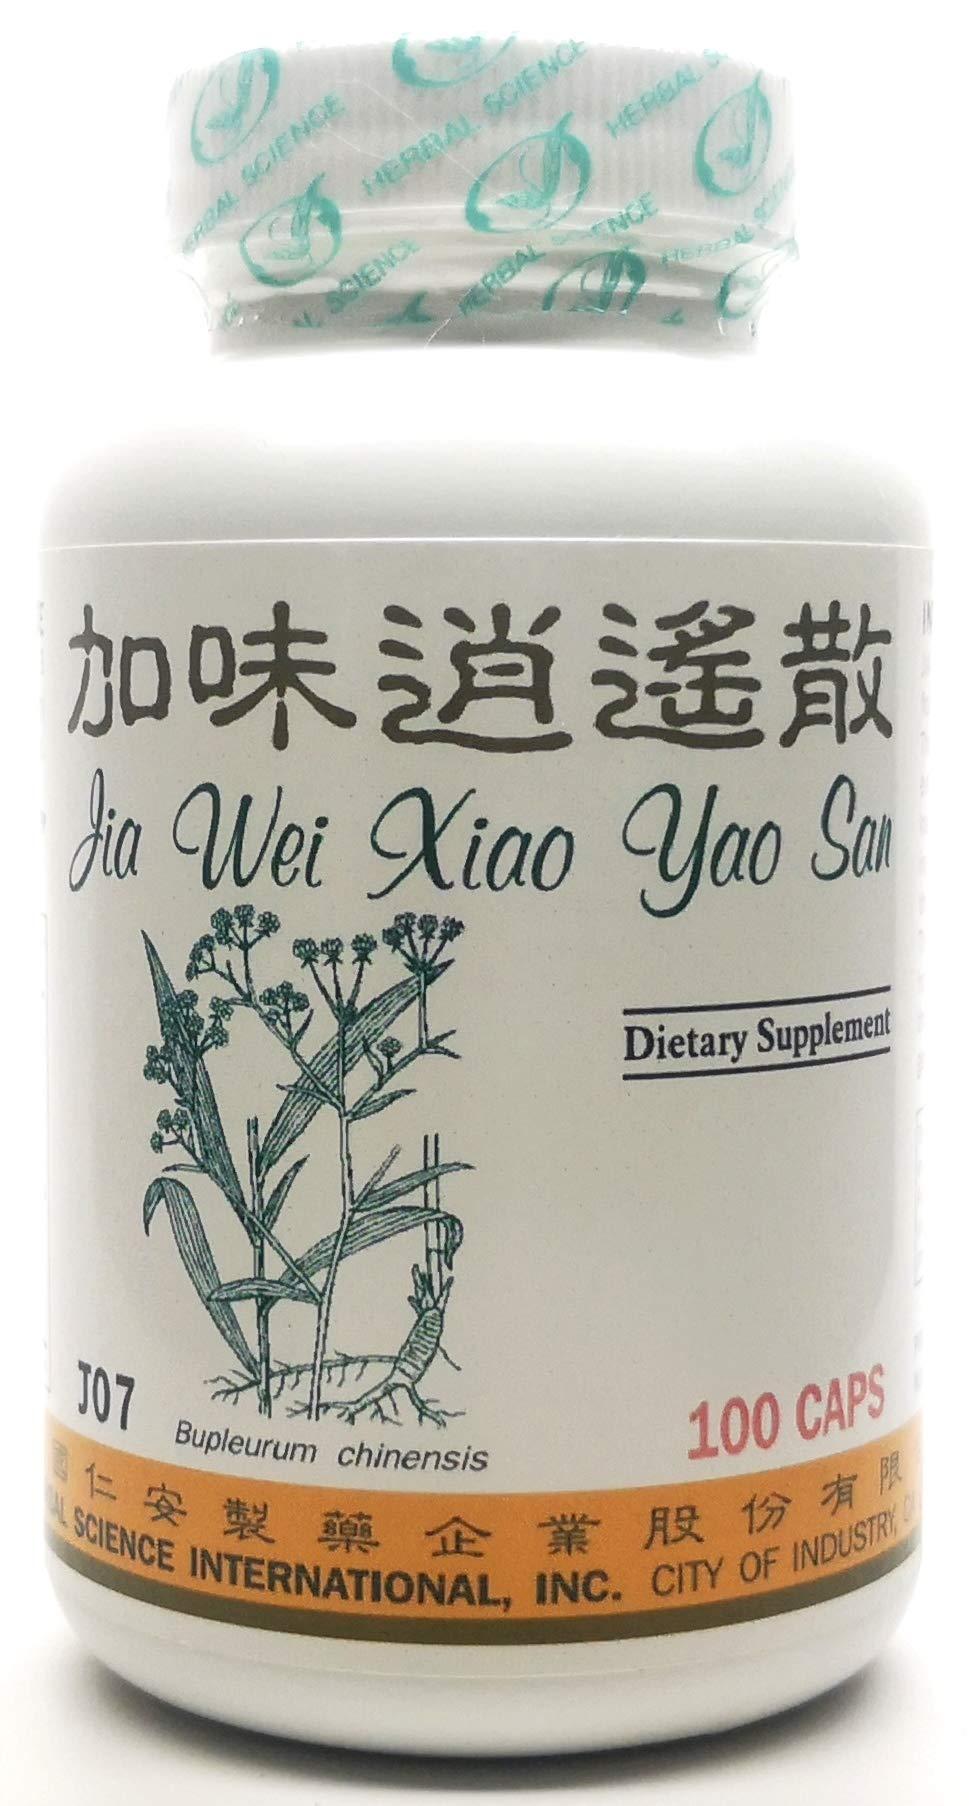 Liver Energy Plus Dietary Supplement 500mg 100 Capsules (Jia Wei Xiao Yao San, Augmented Rambling, Rambling Plus) J07 100% Natural Herbs TCM Formula